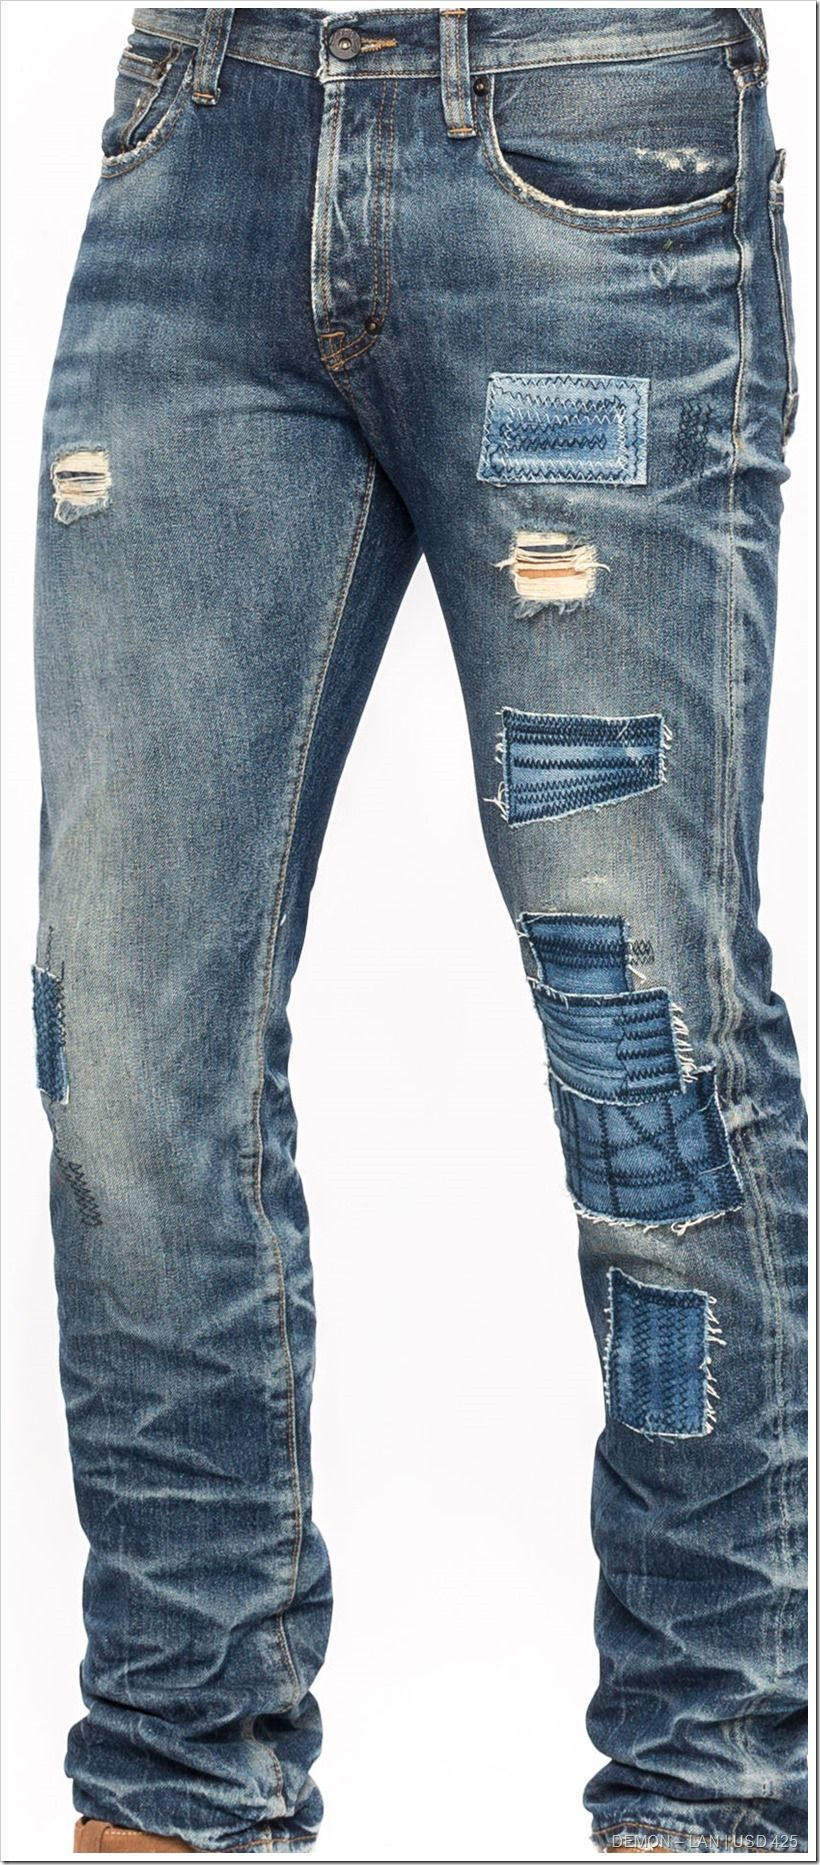 46 Ideas De Jeans Hombre Jeans Hombre Jeans Pantalones De Mezclilla